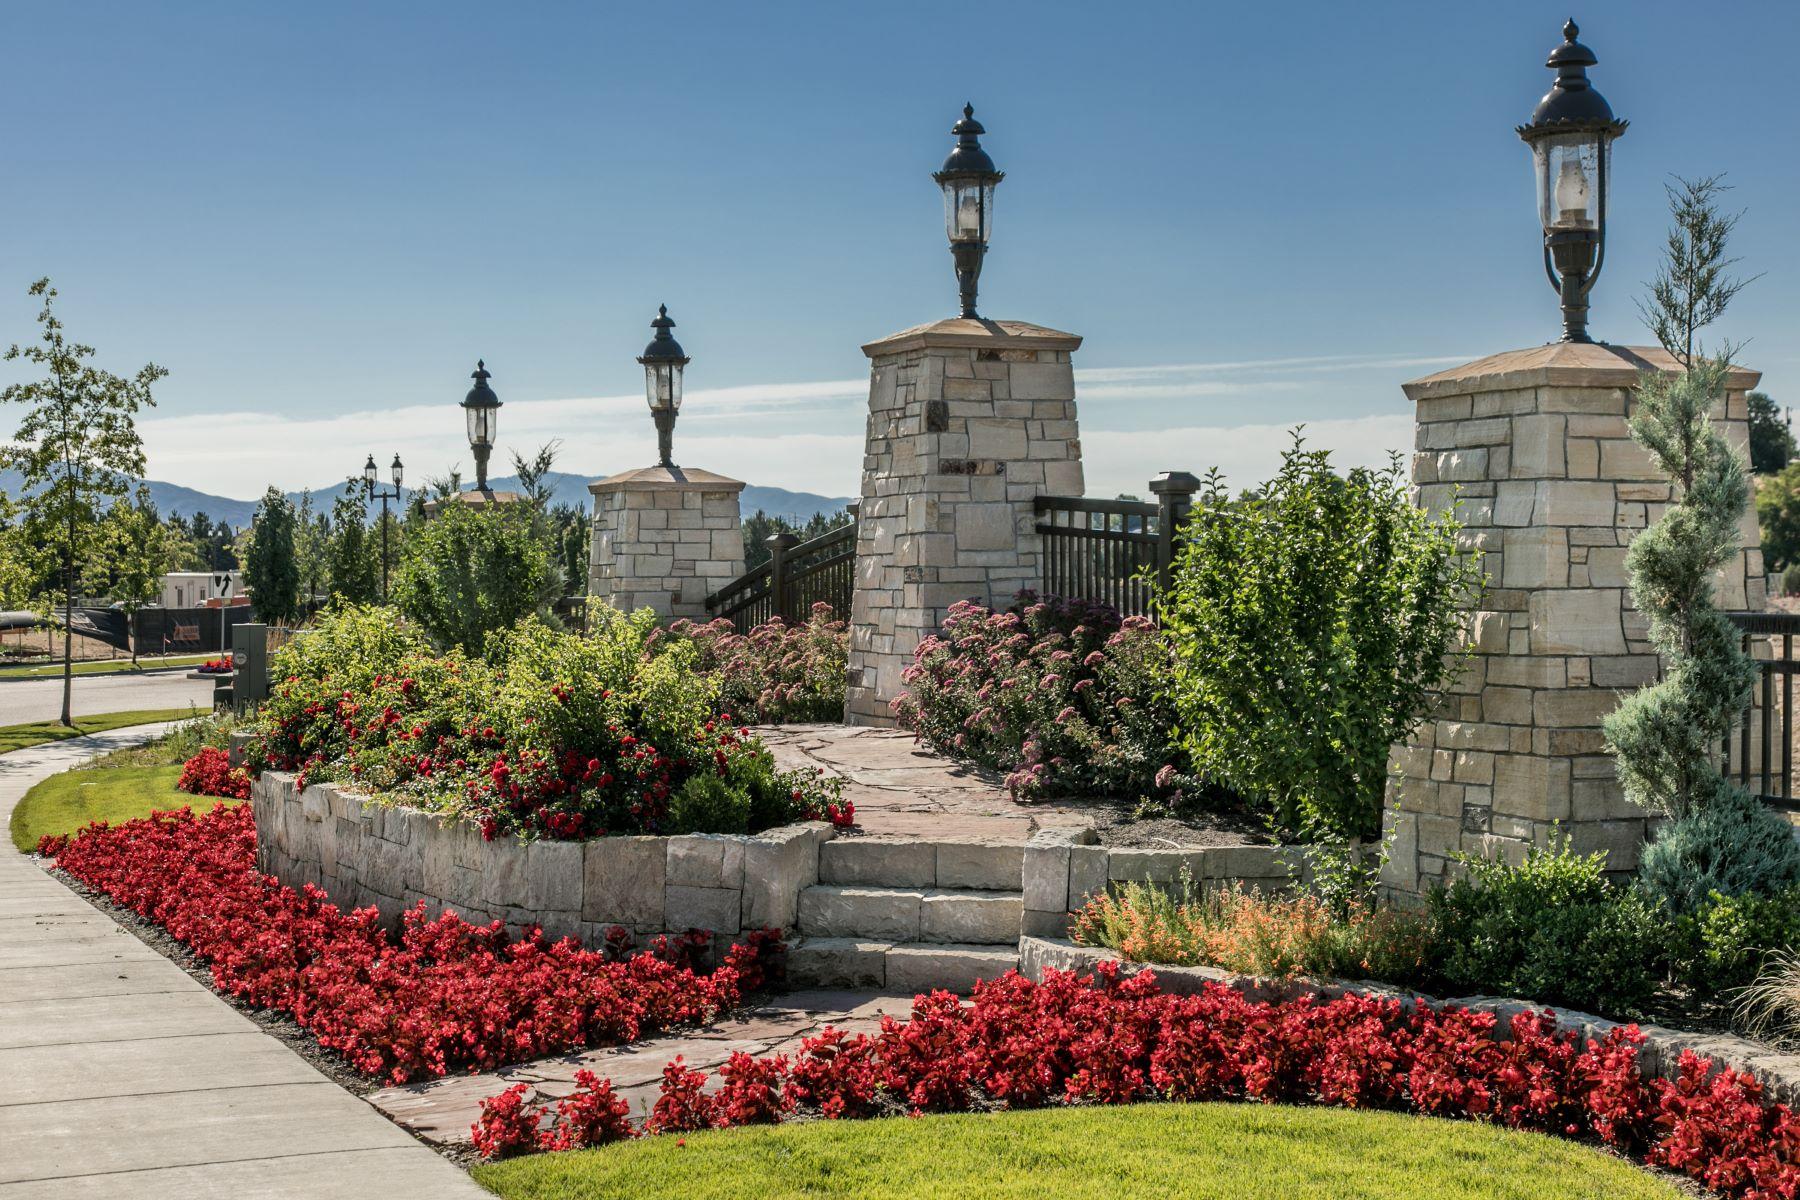 Single Family Homes for Sale at 800 Ashbourne Lane, Eagle 800 E Ashbourne Ln Eagle, Idaho 83616 United States